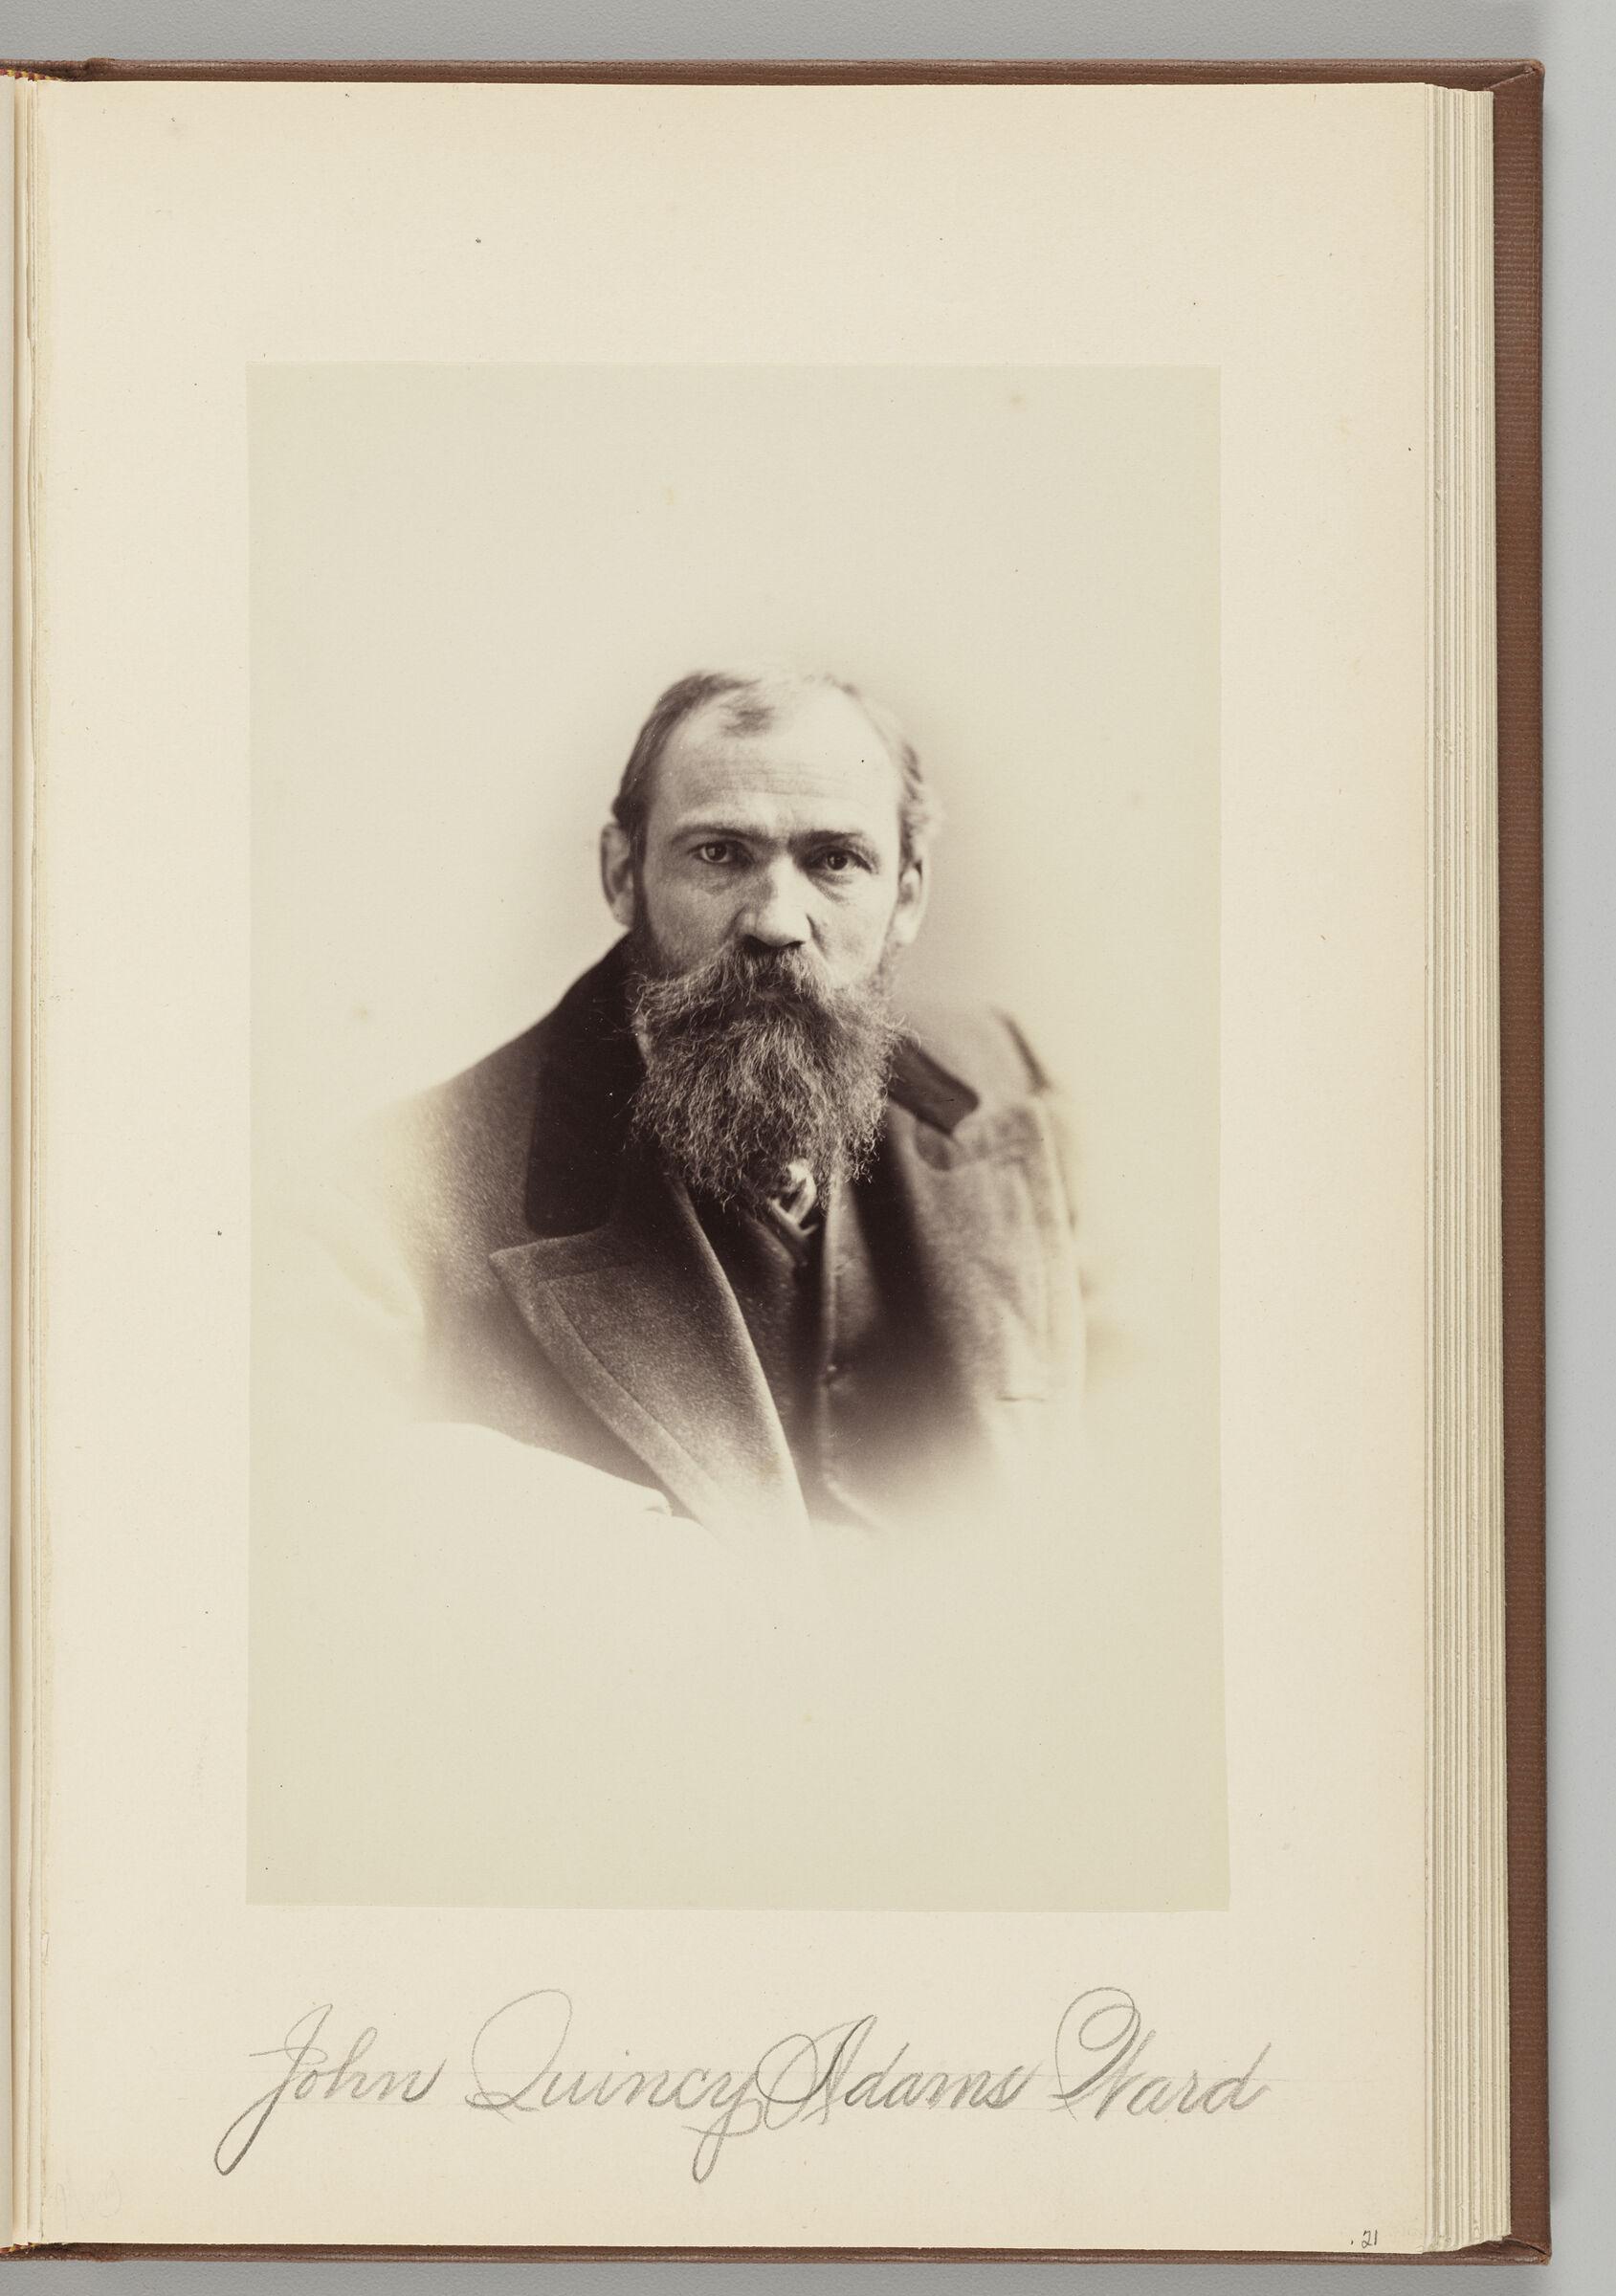 John Quincy Adams Ward (1830-1910)